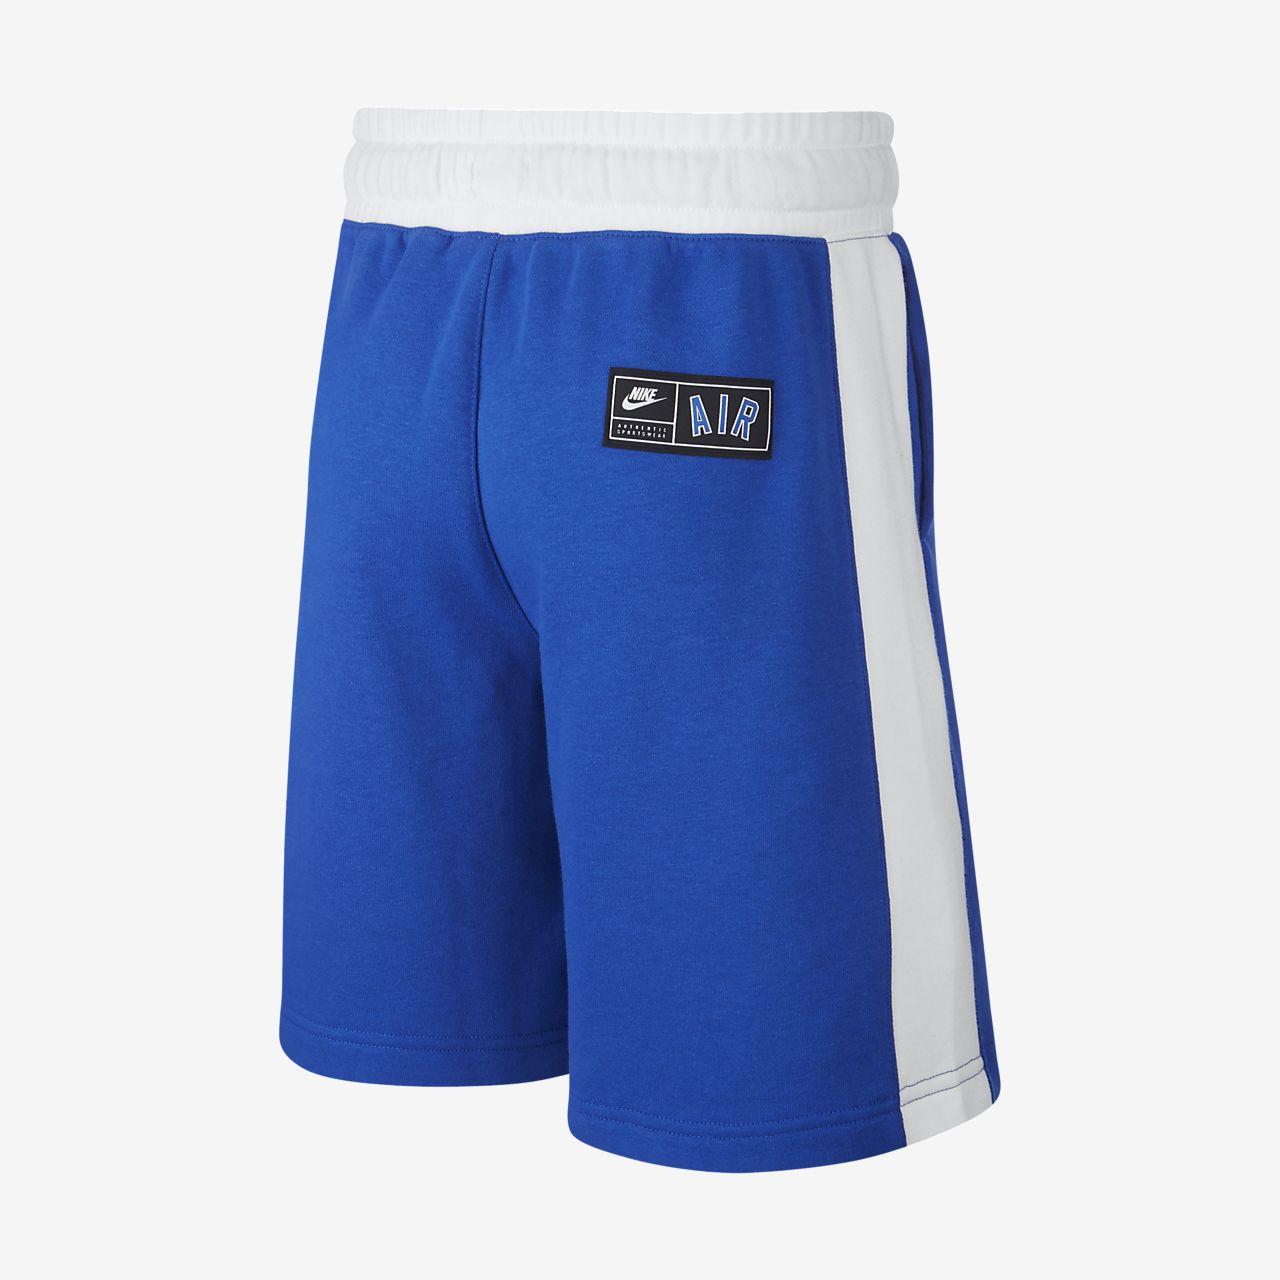 6cb87cc6dab Nike Air Older Kids  (Boys ) Shorts. Nike.com RO